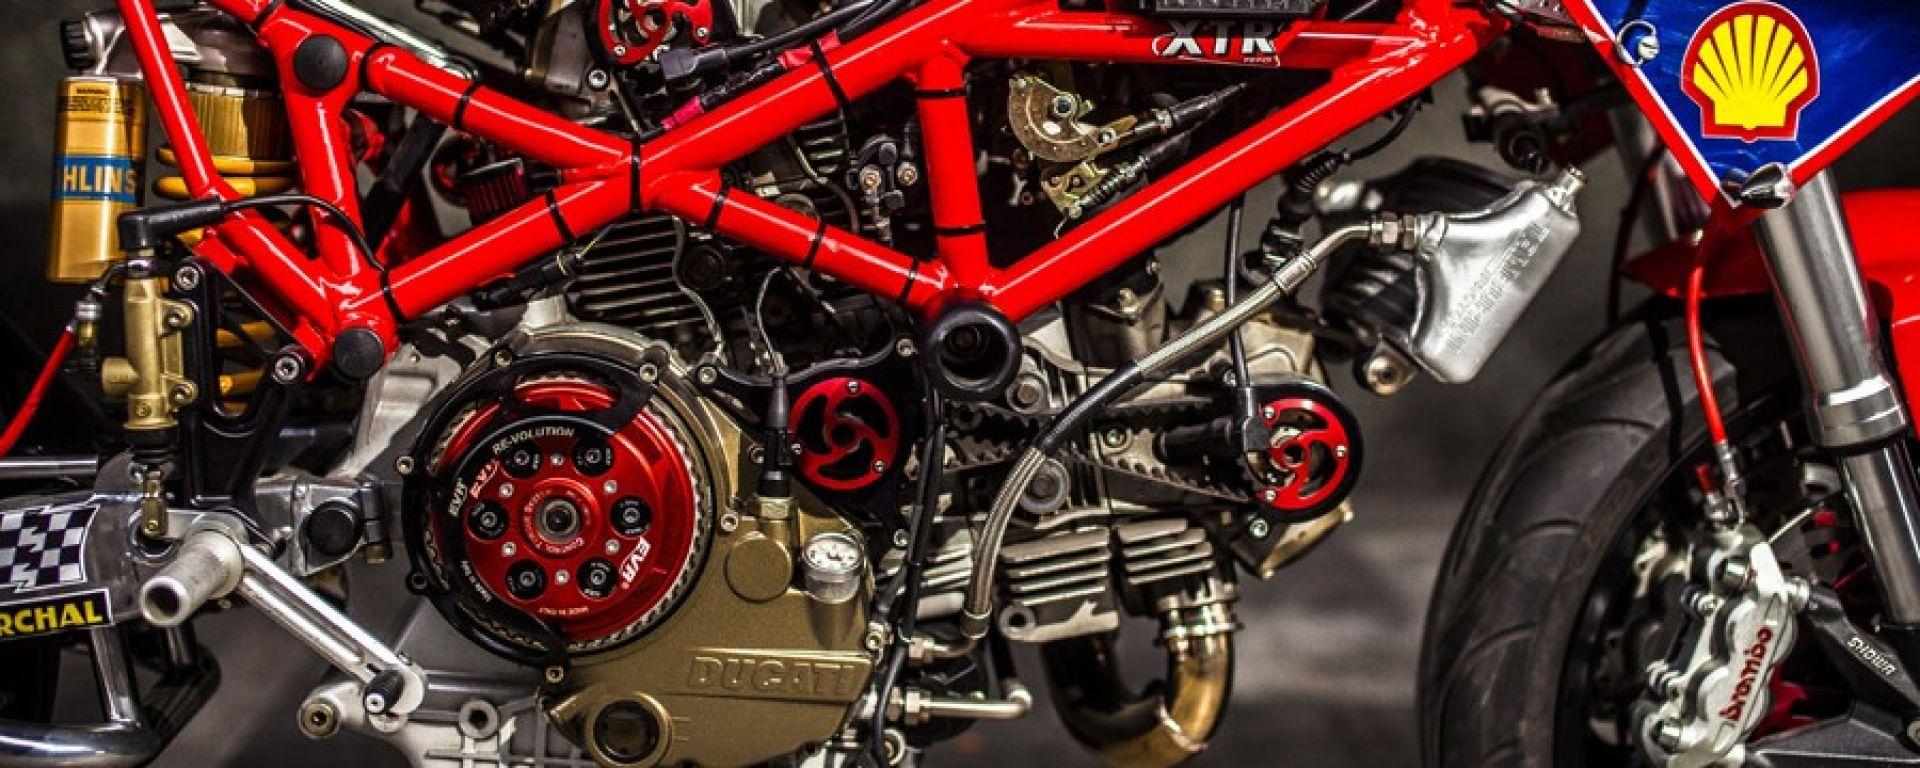 Ducati Monster 1000 Pata Negra by XTR